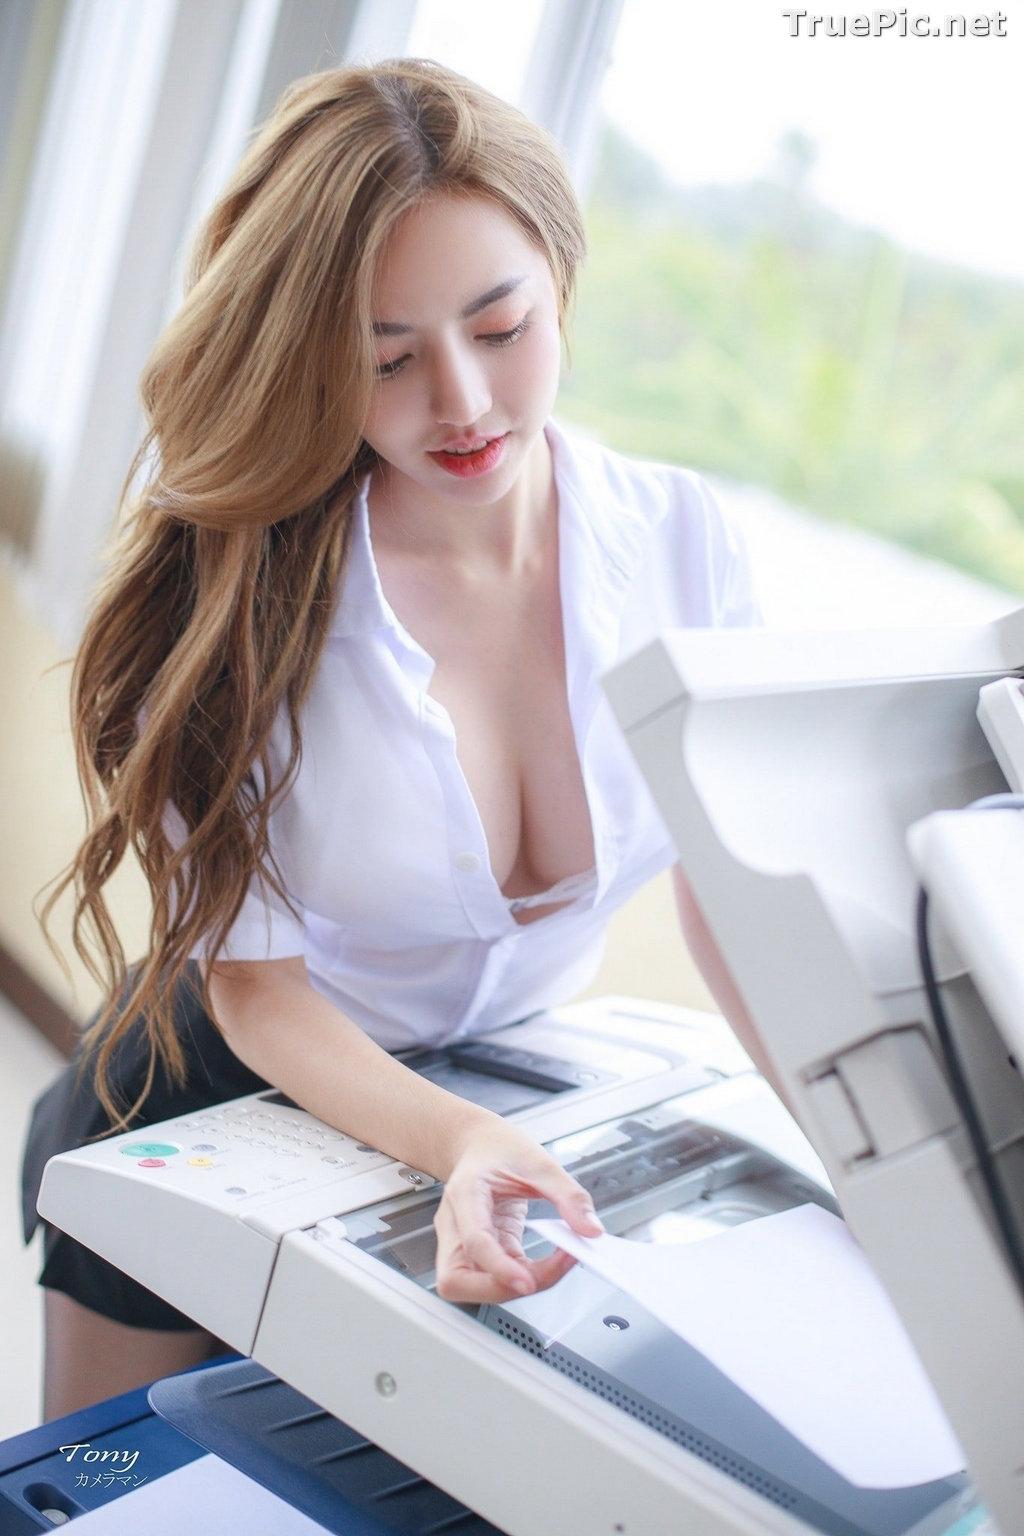 Image Thailand Model - Champ Phawida - Sexy Secretary and Office Uniform - TruePic.net - Picture-10